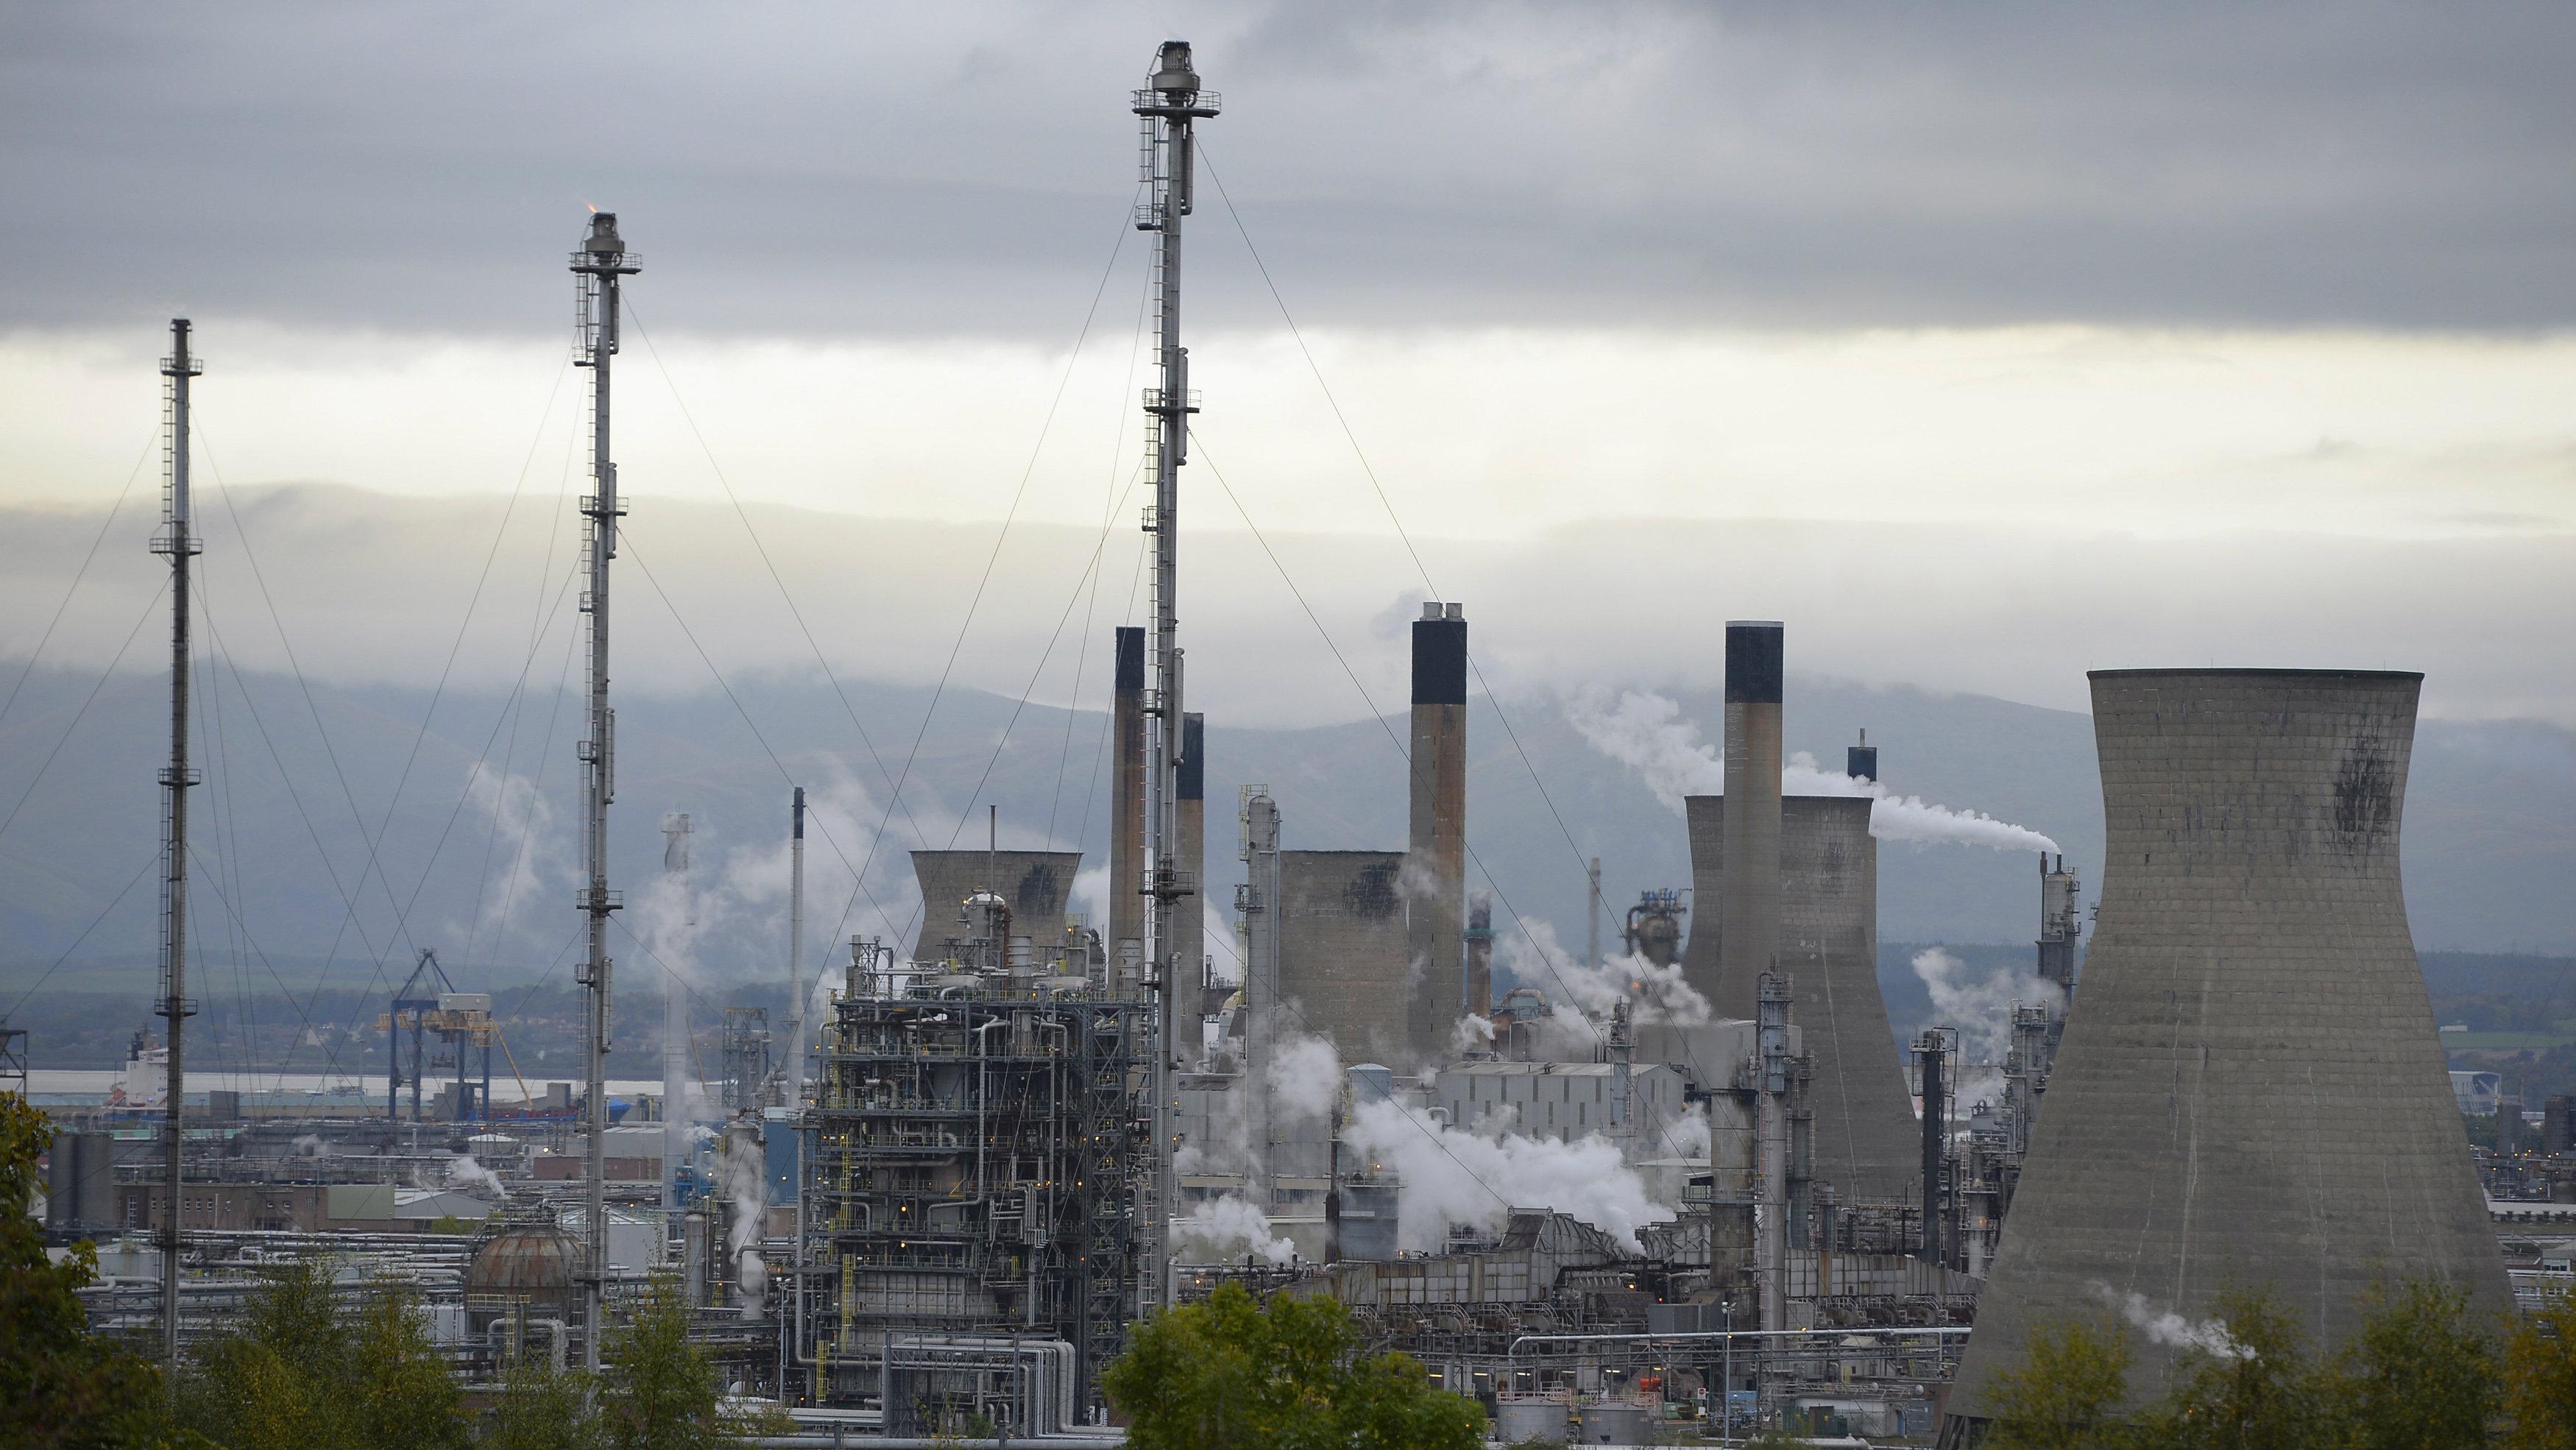 Oil refinery at Grangemouth, Scotland